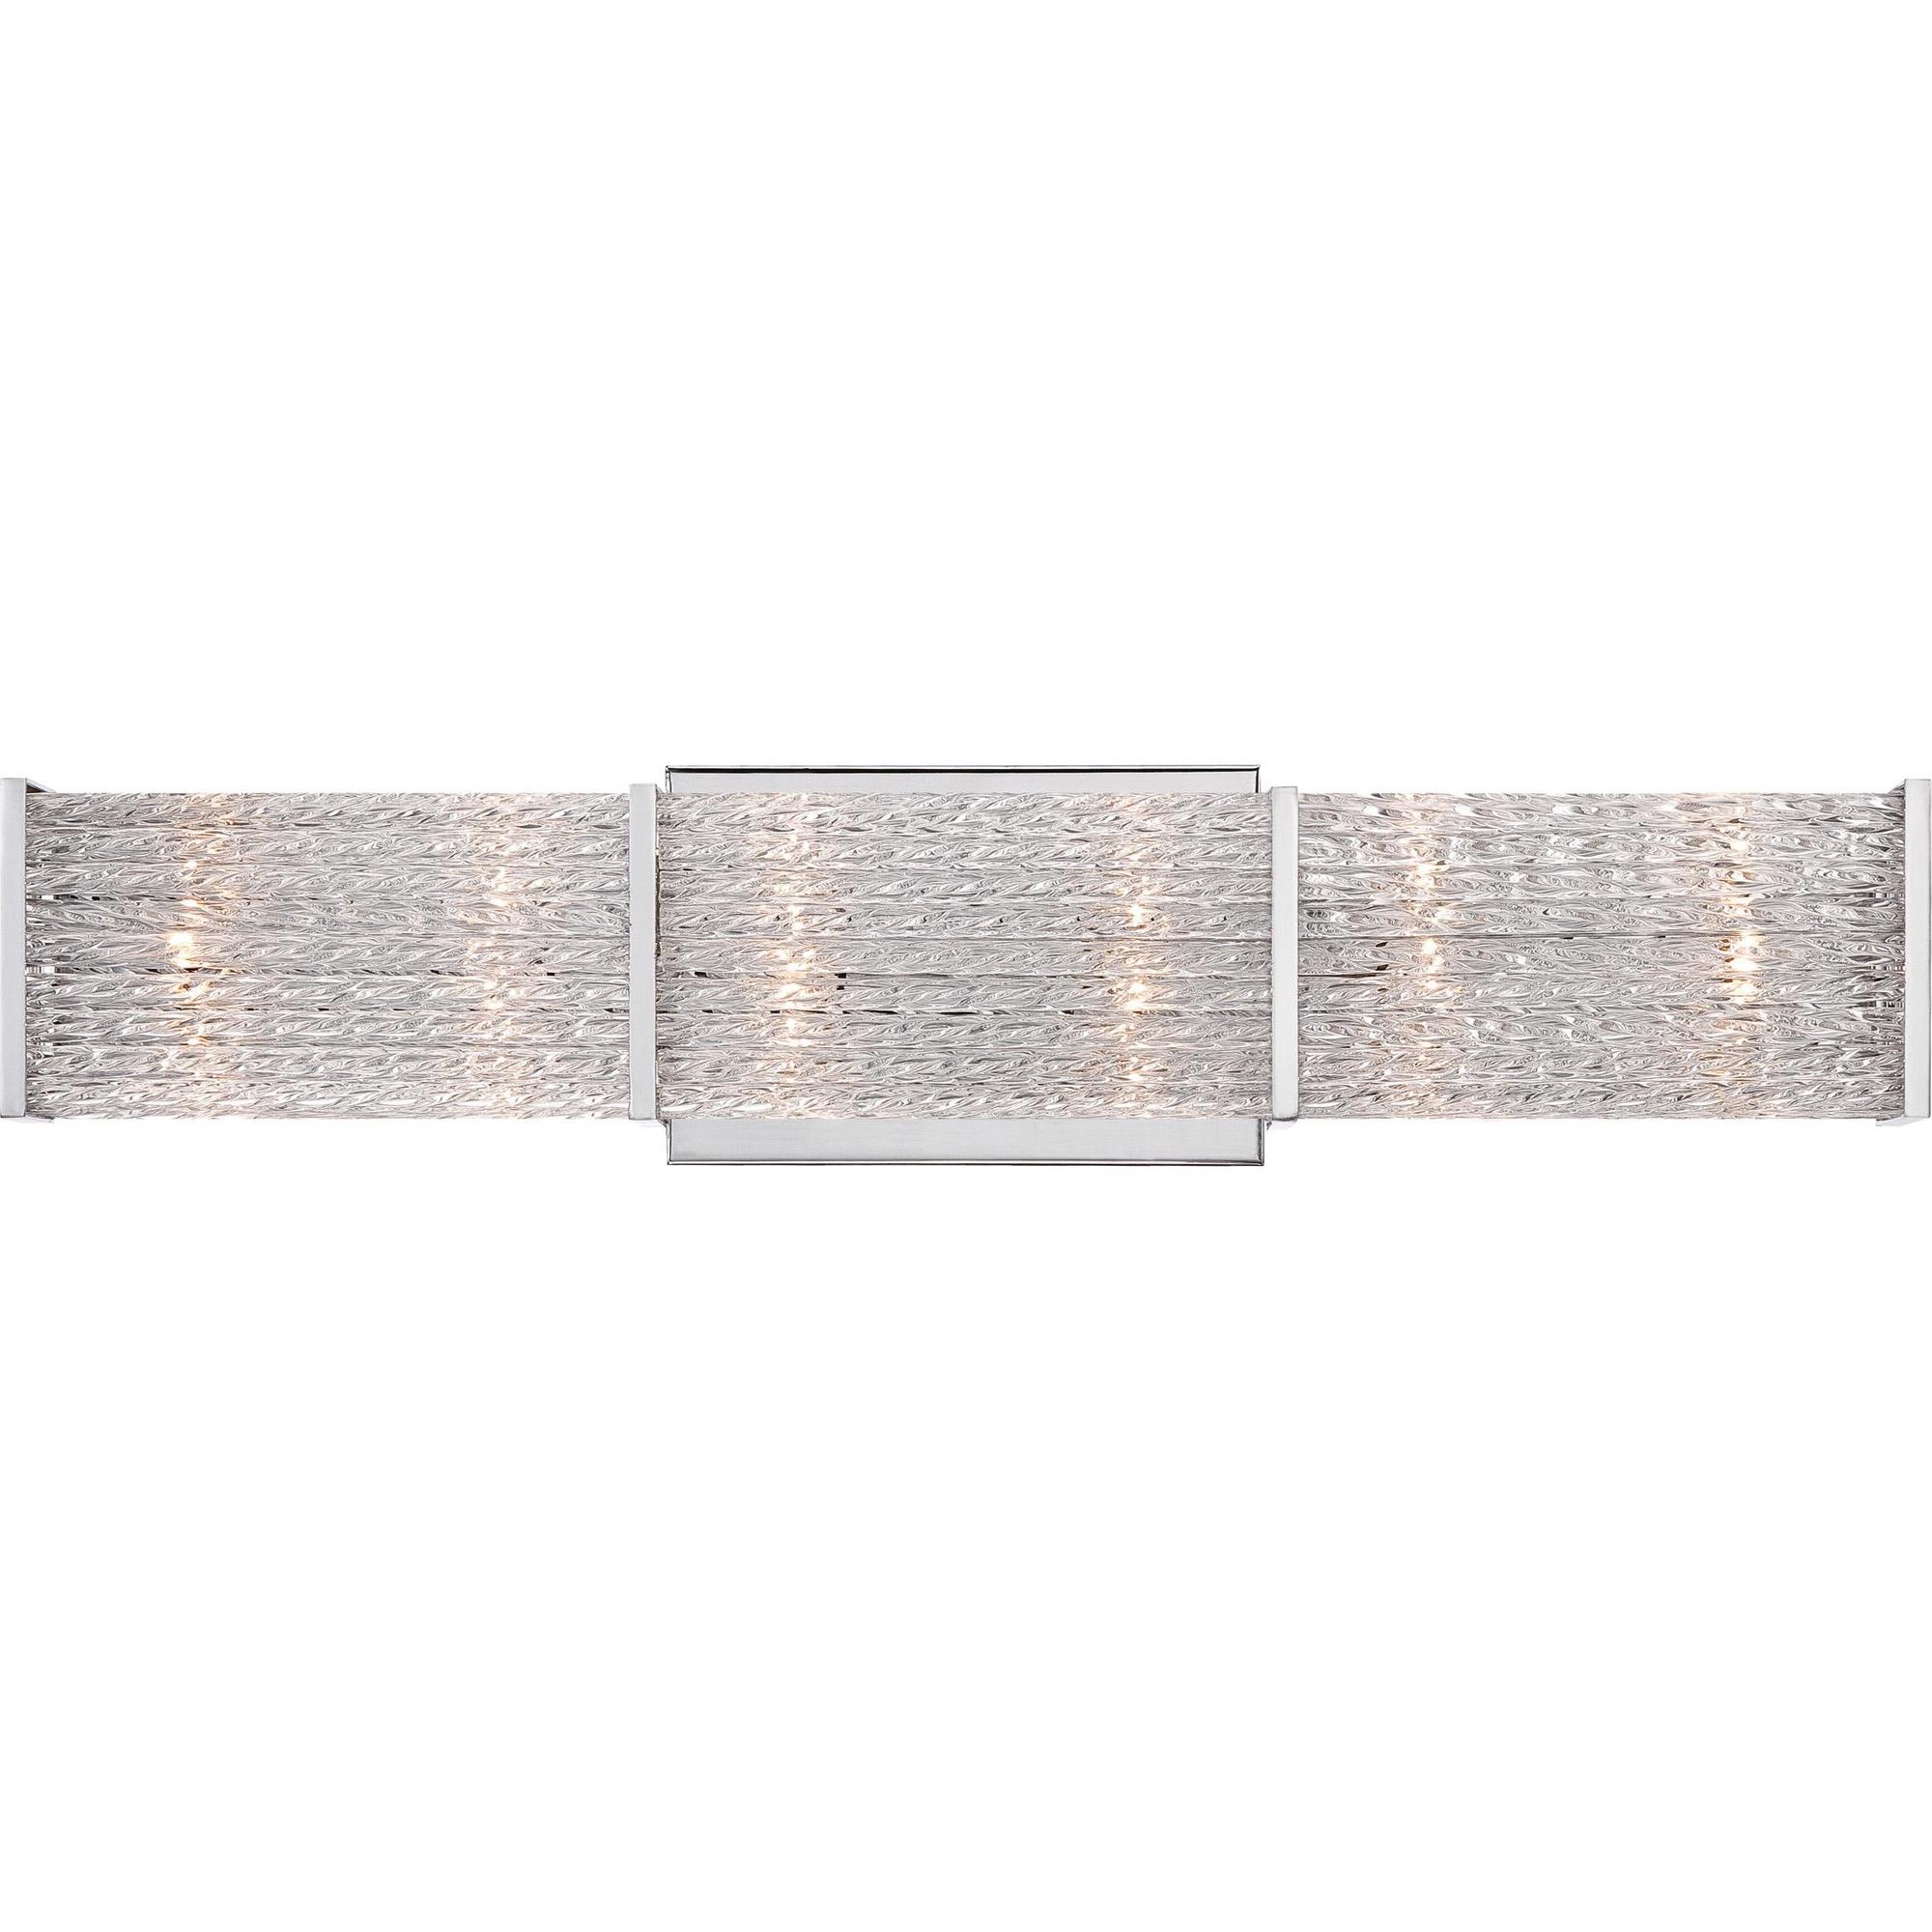 Quoizel Lighting PRN8606C 6-Light Crystal Up/Down Mount Bath Fixture ...